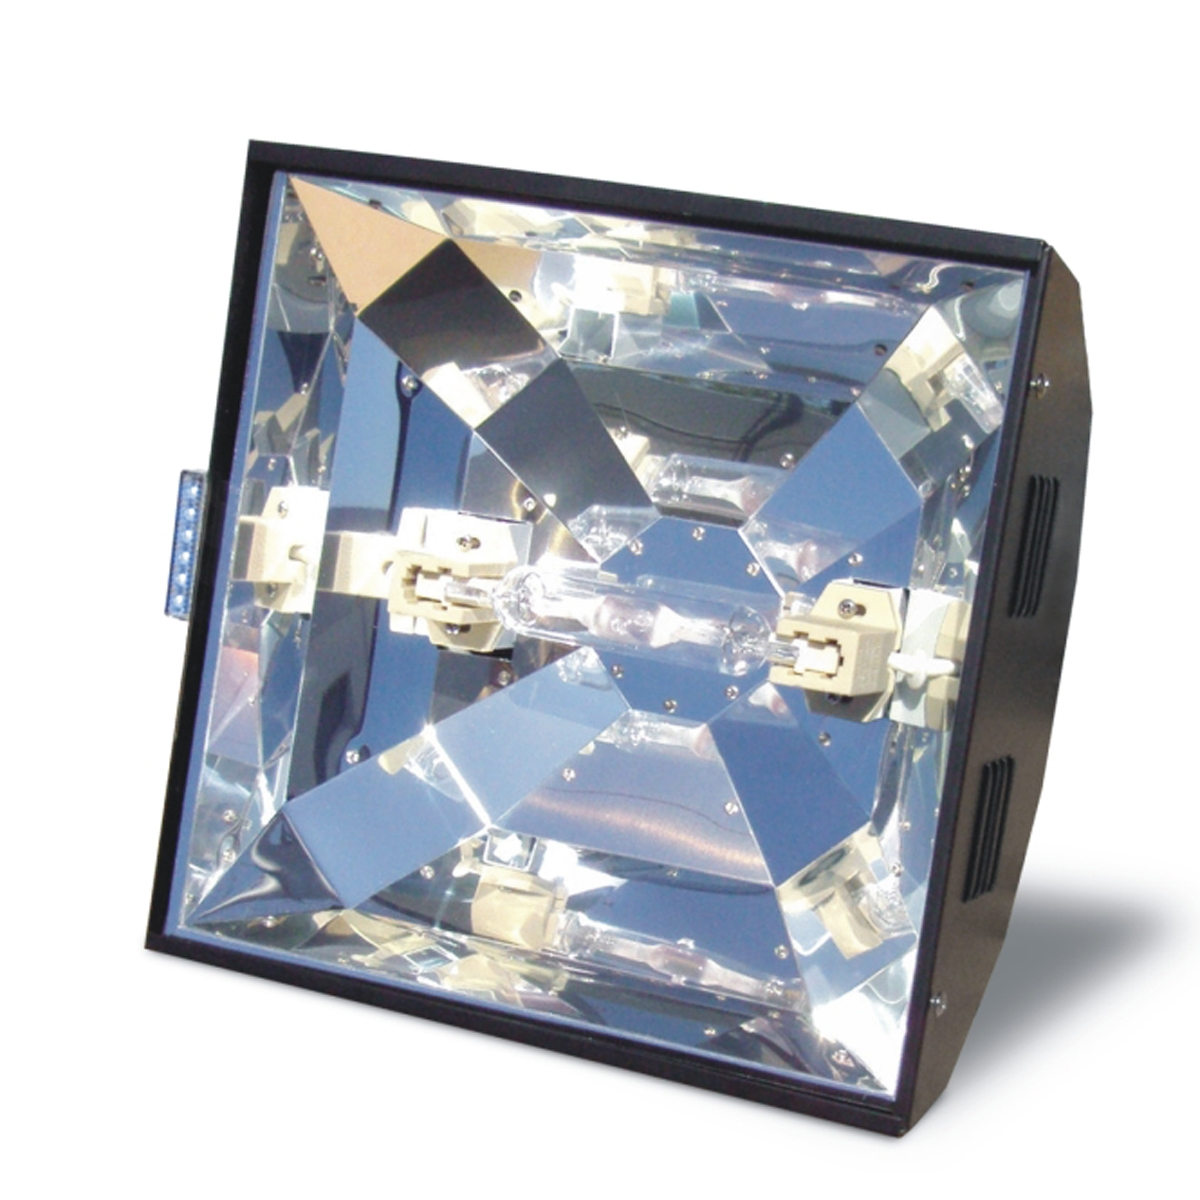 Hamilton Technology Bimini Sun 250w Metal Halide System: 400W Cayman Sun Double Ended Metal Halide Reflector (OPEN